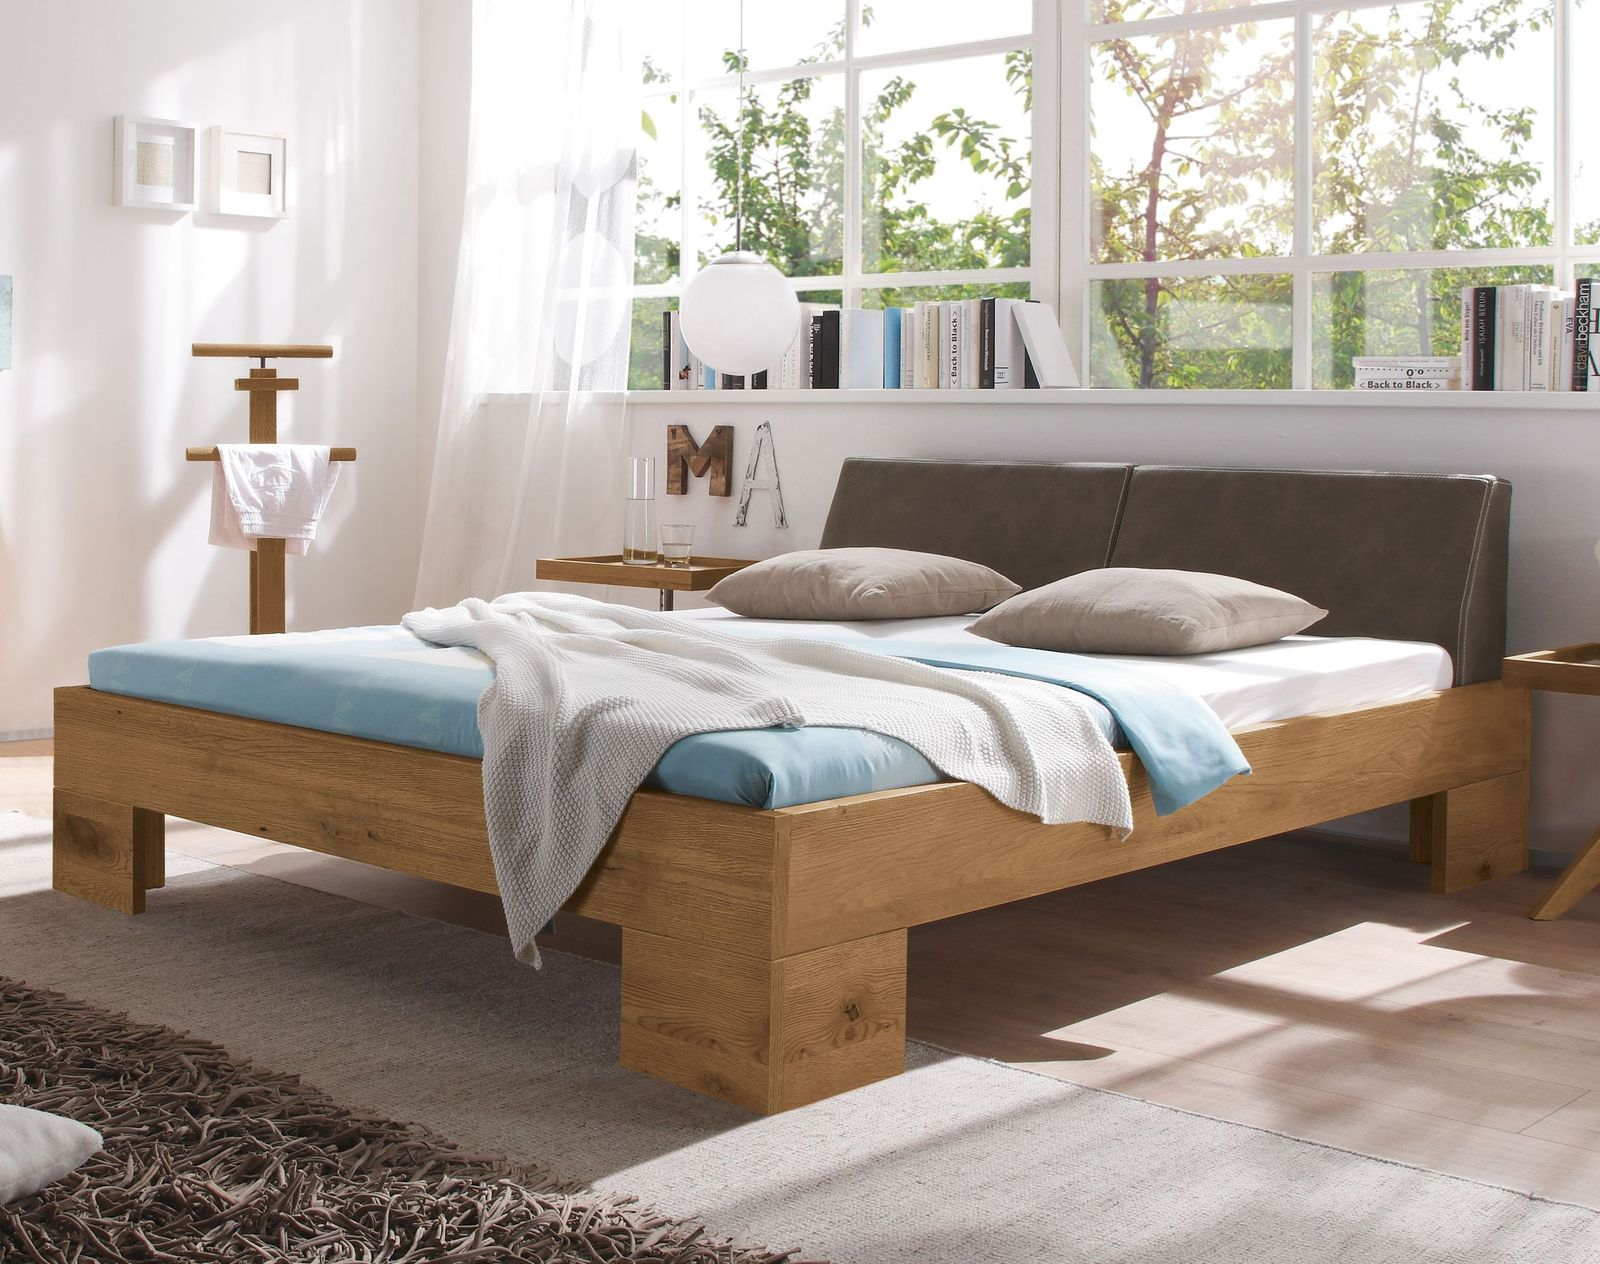 Full Size of Rustikales Bett Selber Bauen Rustikale Holzbetten Betten Kaufen Aus Holz Rustikal Gunstig 140x200 Massivholzbetten Mit Schrgem Polsterkopfteil Dano Bettende Bett Rustikales Bett